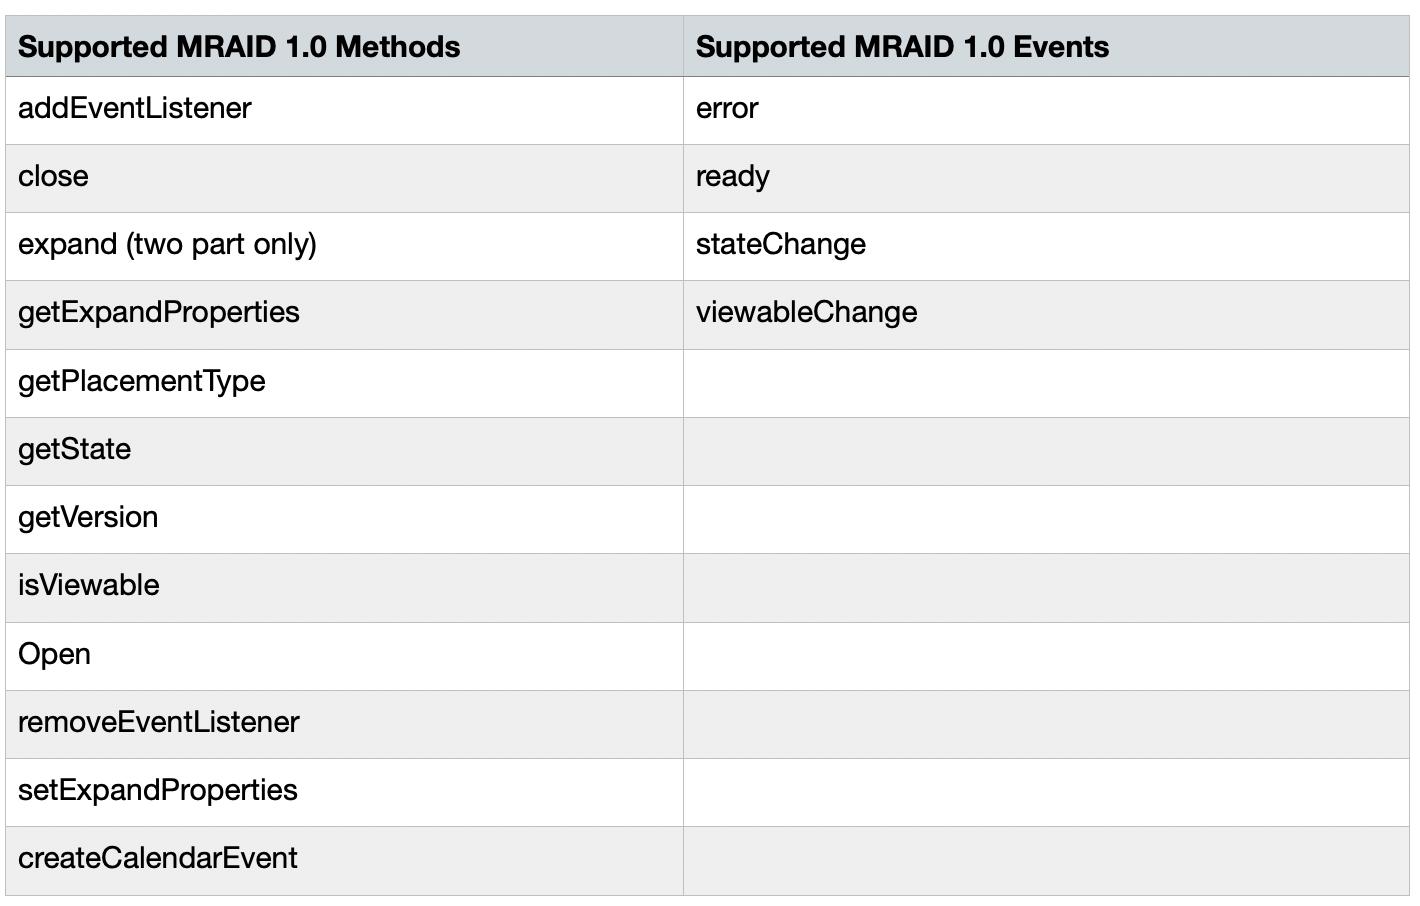 MRAID compliance